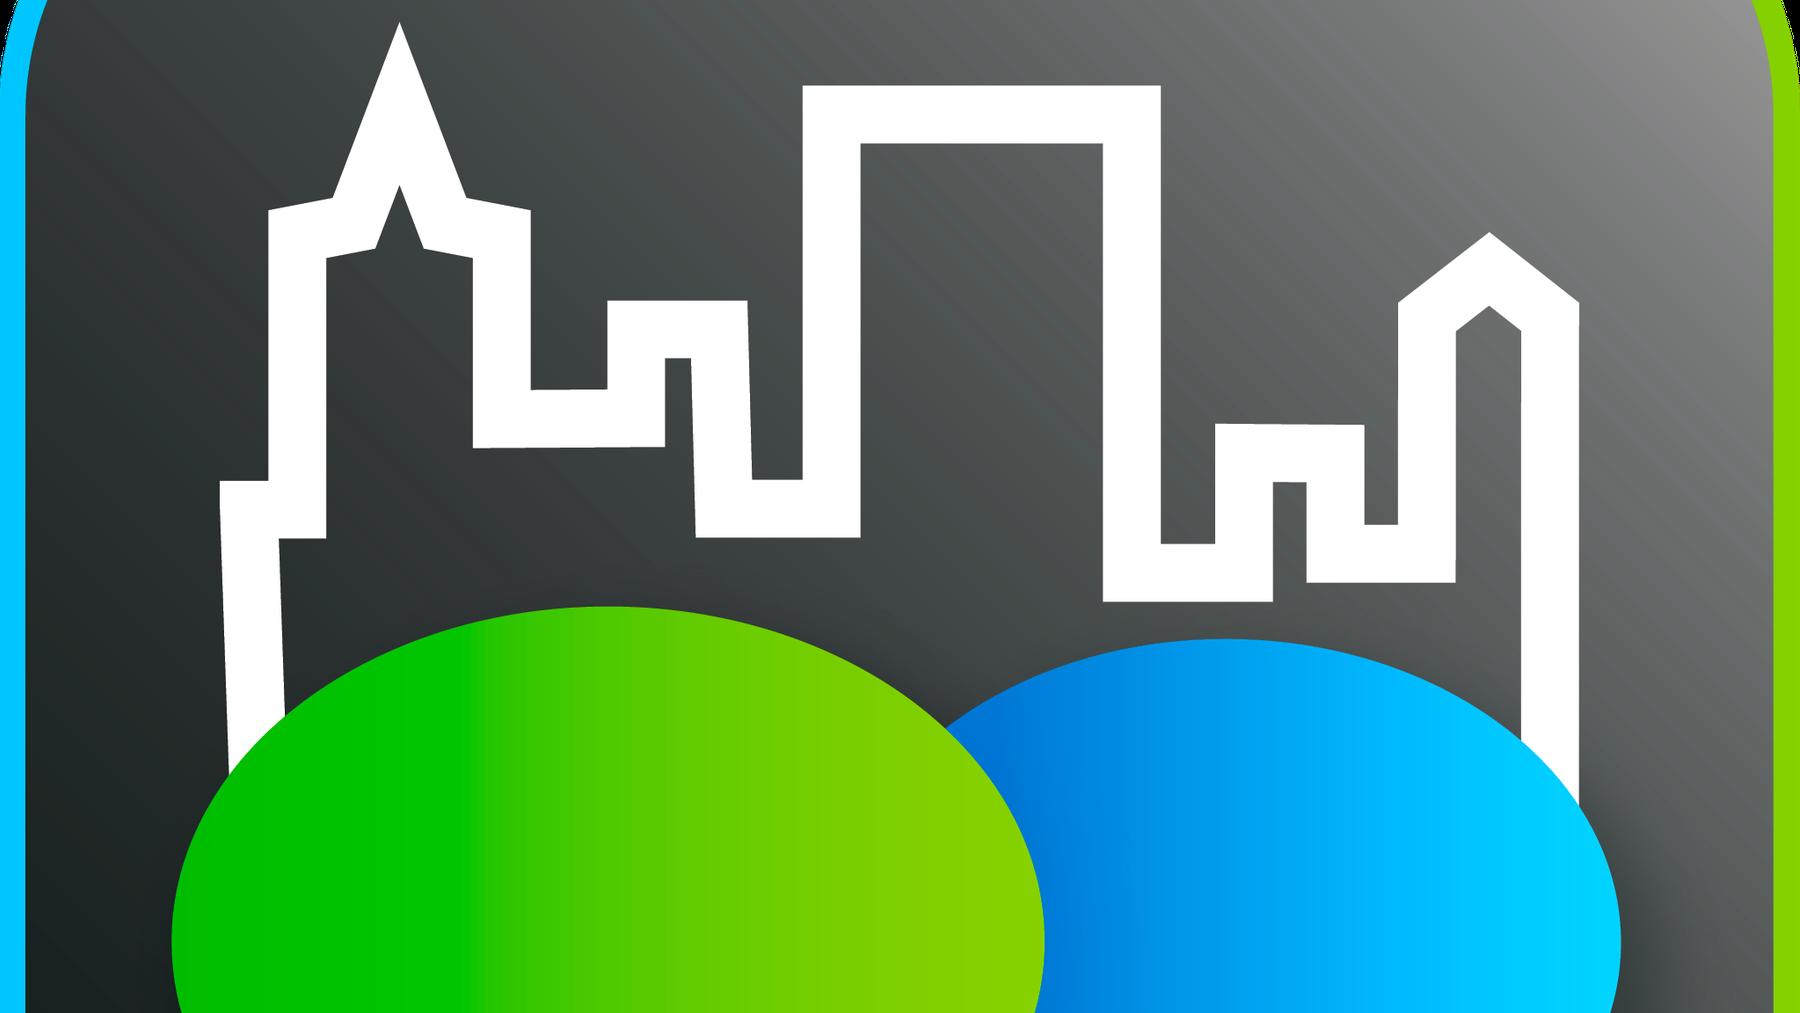 FHS_IFU_CityMessenger_Logo